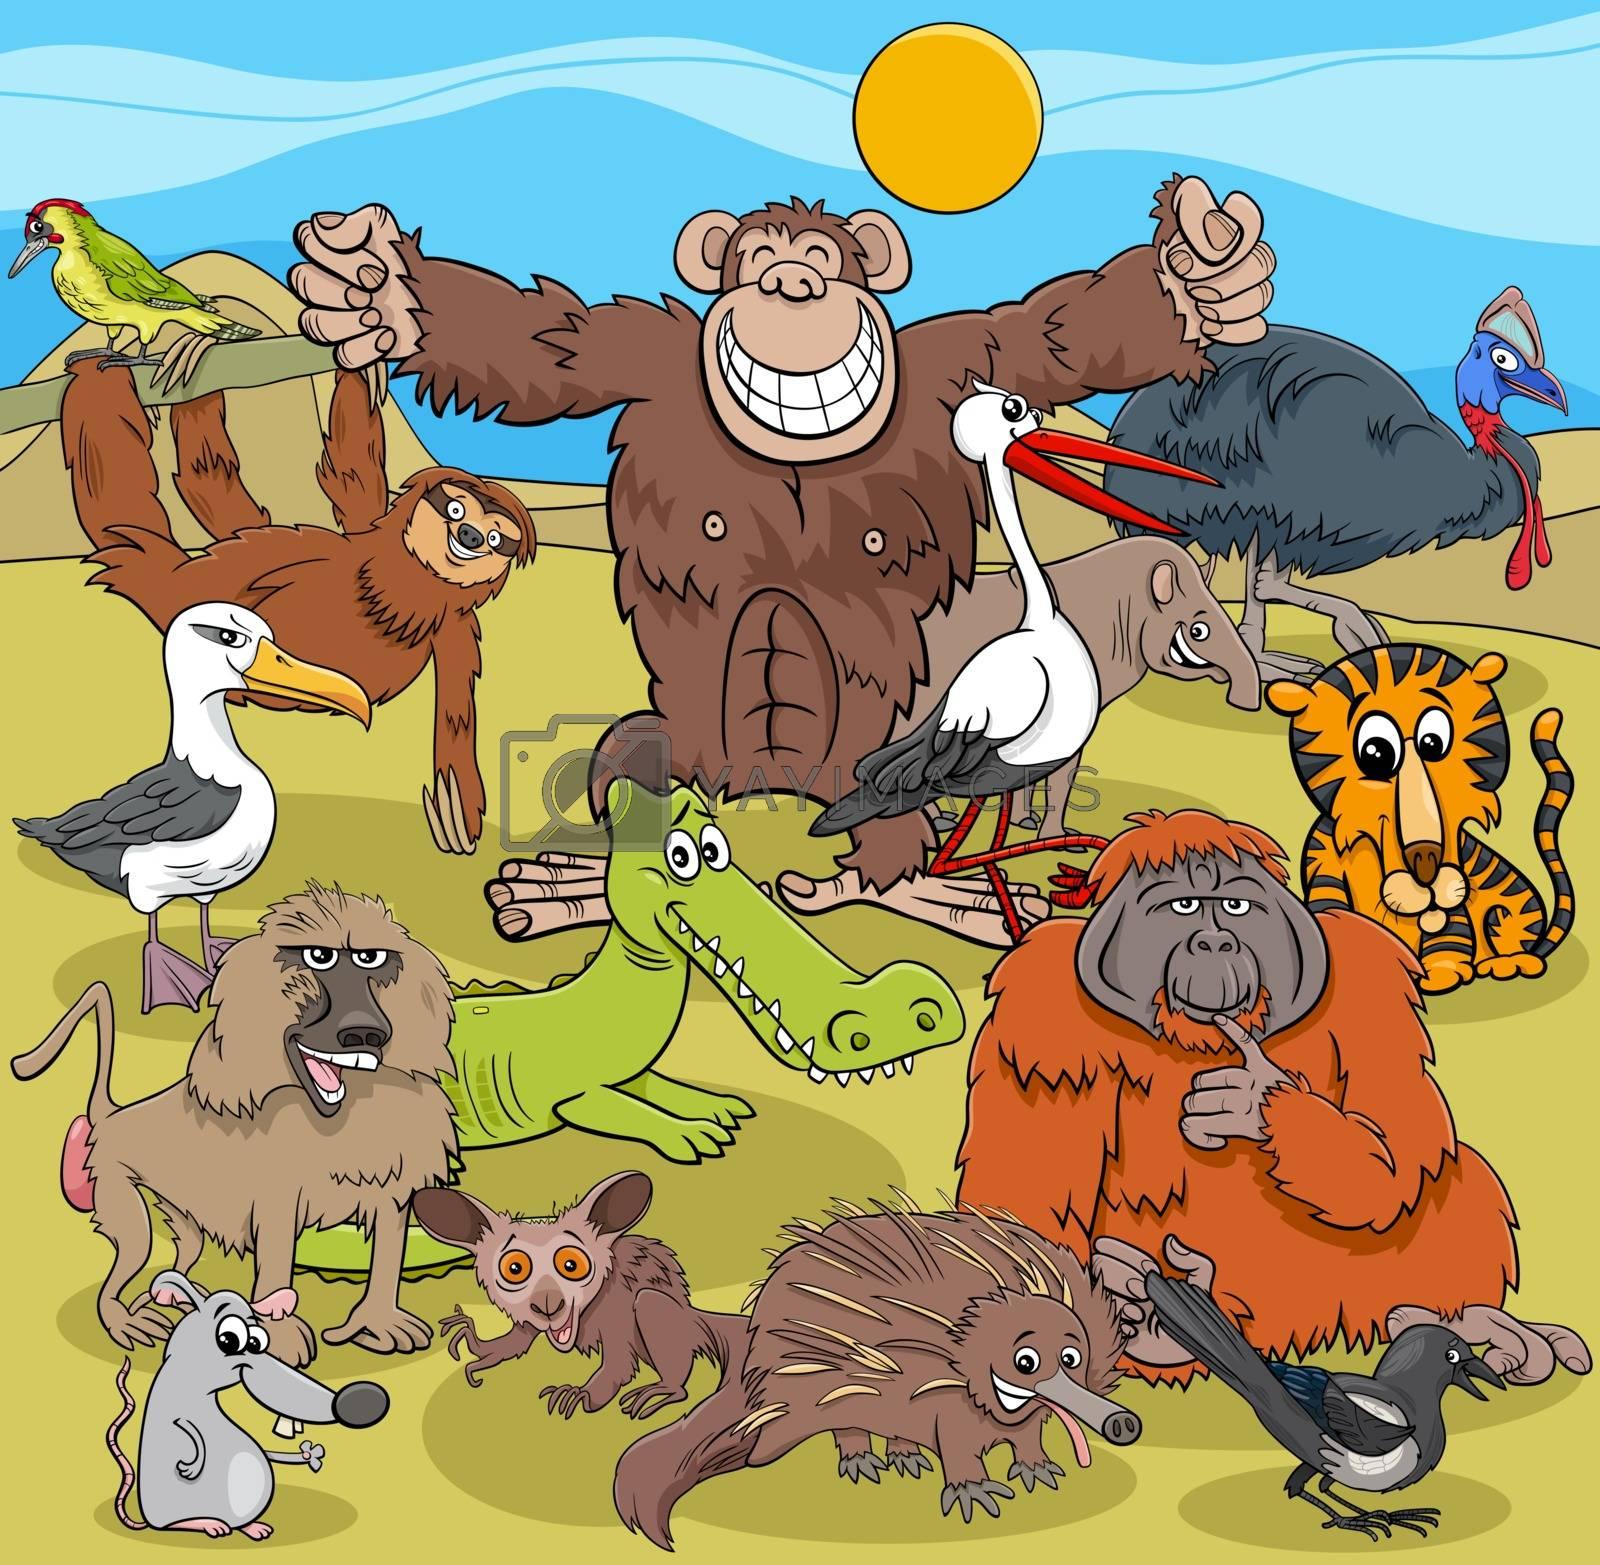 Cartoon Illustrations of Wild Animal Comic Characters Group